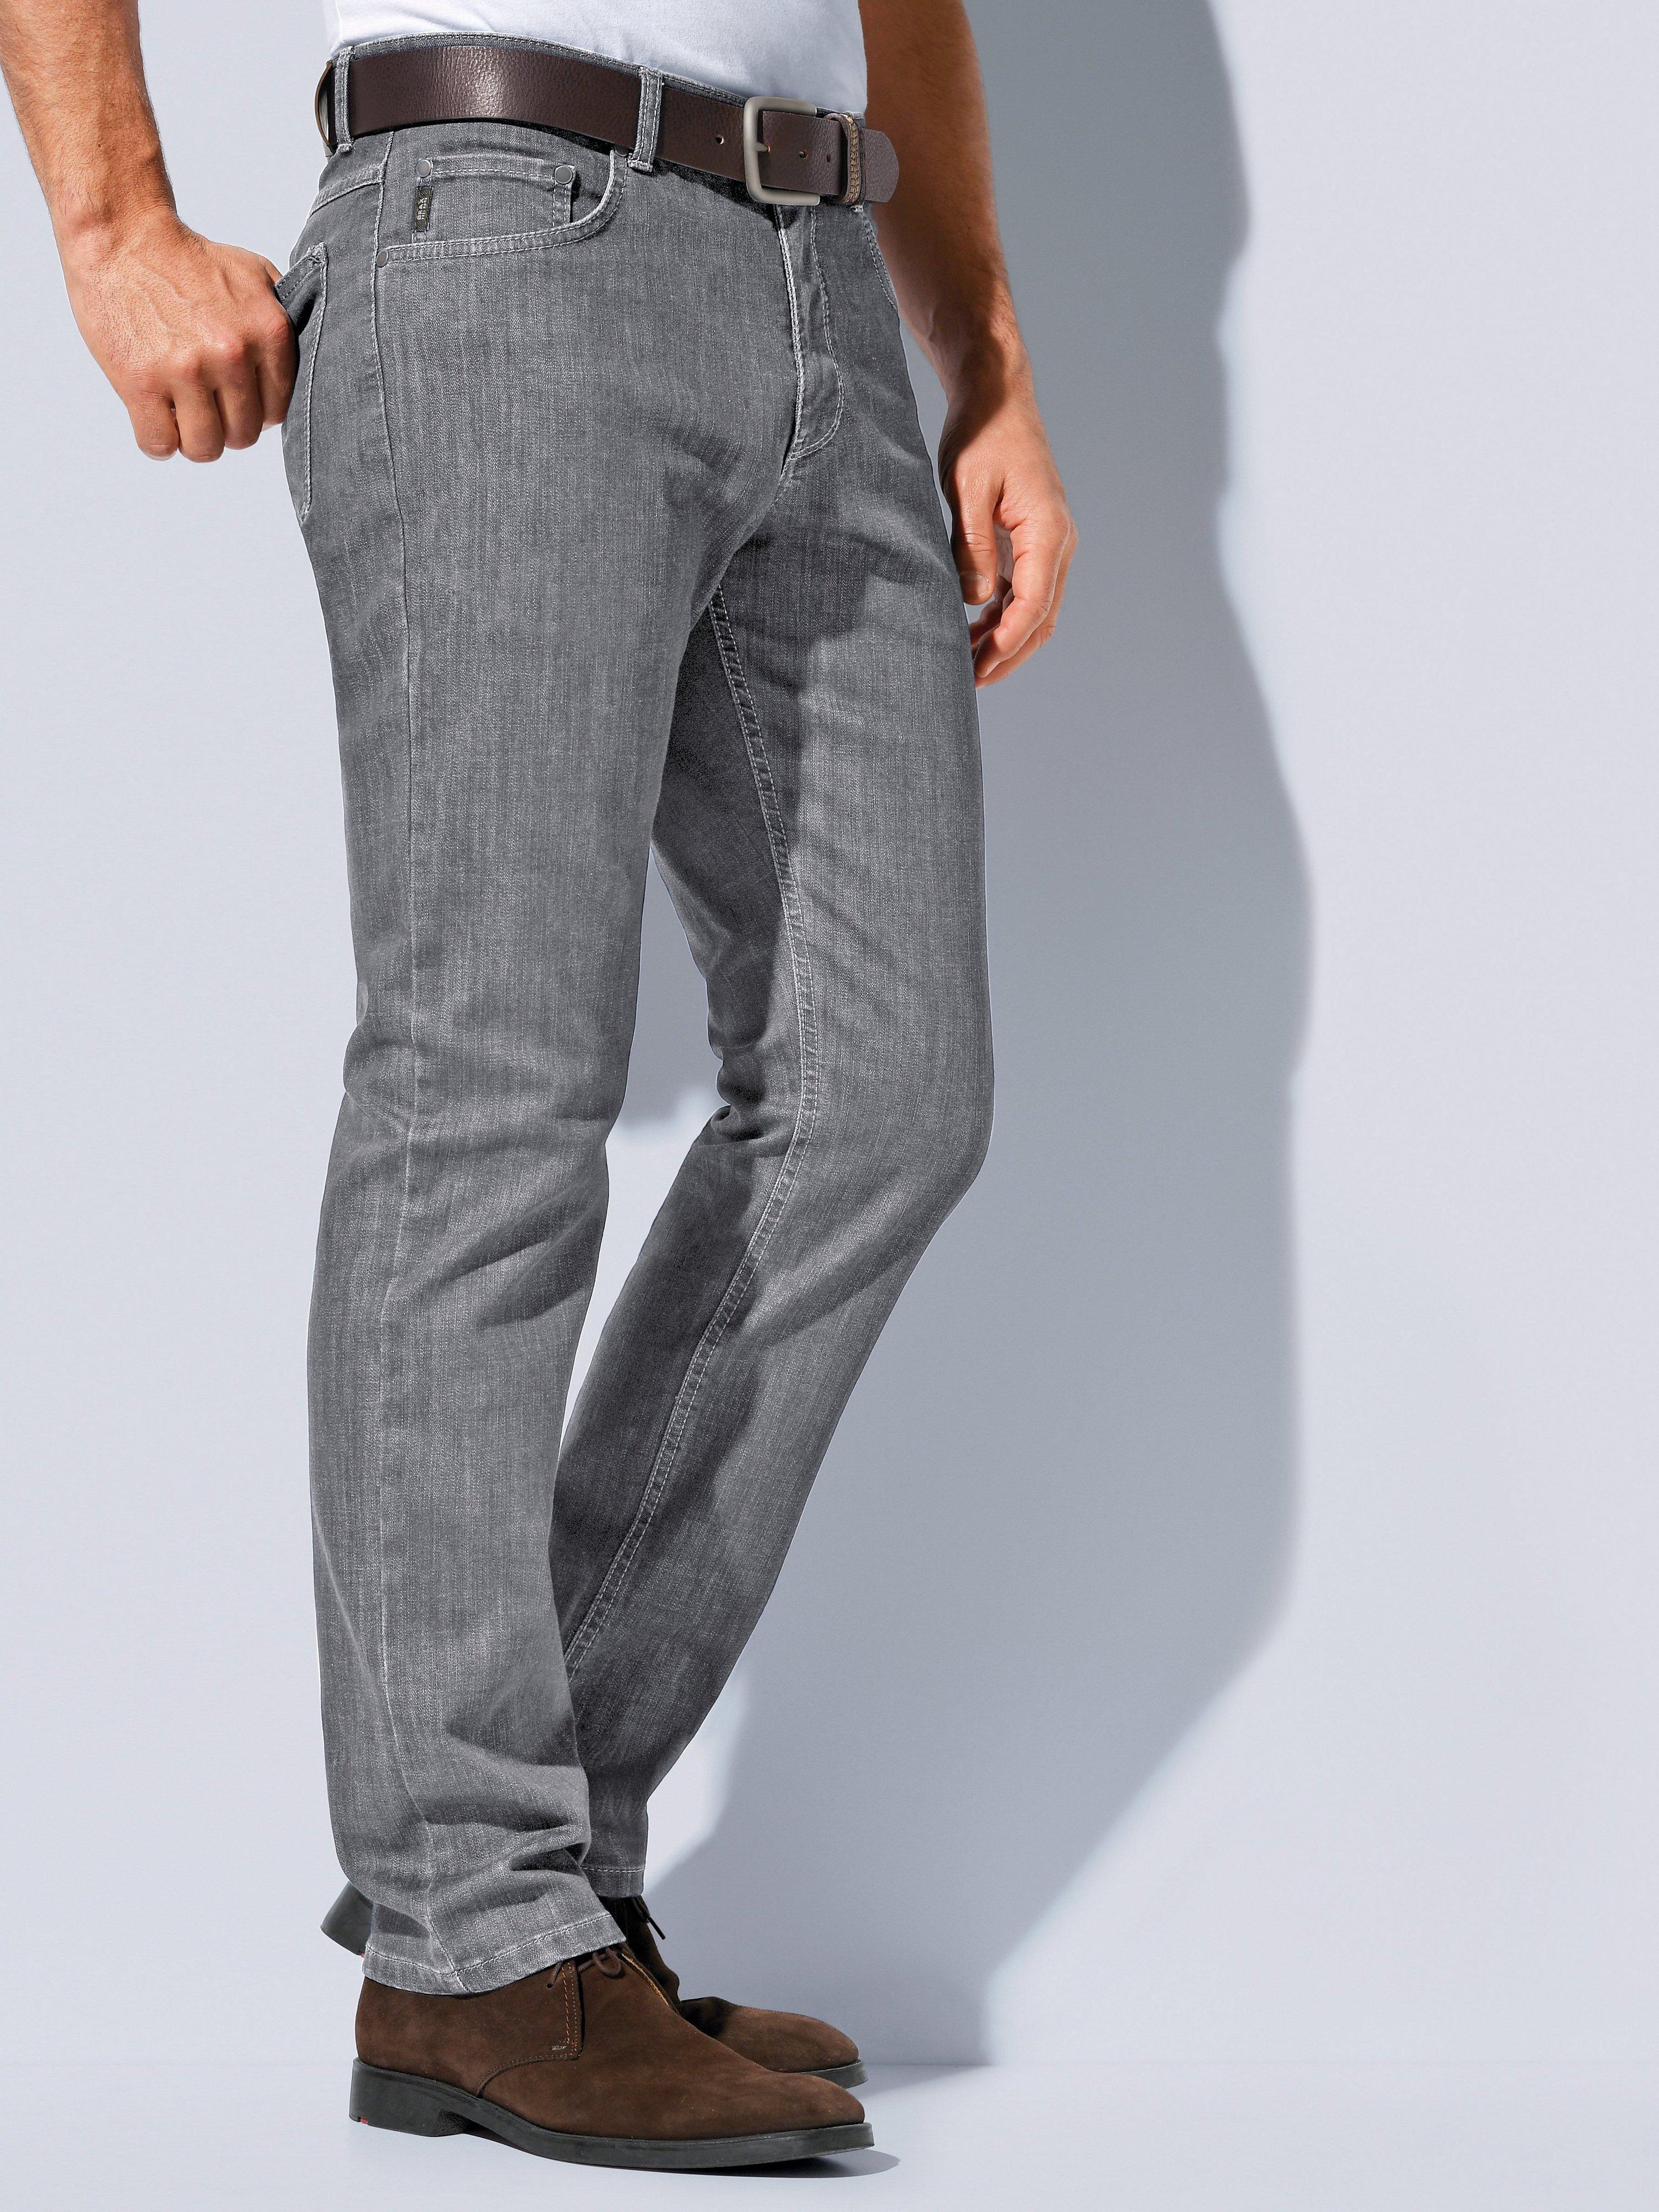 Comfortable Fit jeans design Cooper Denim Brax Feel Good denim